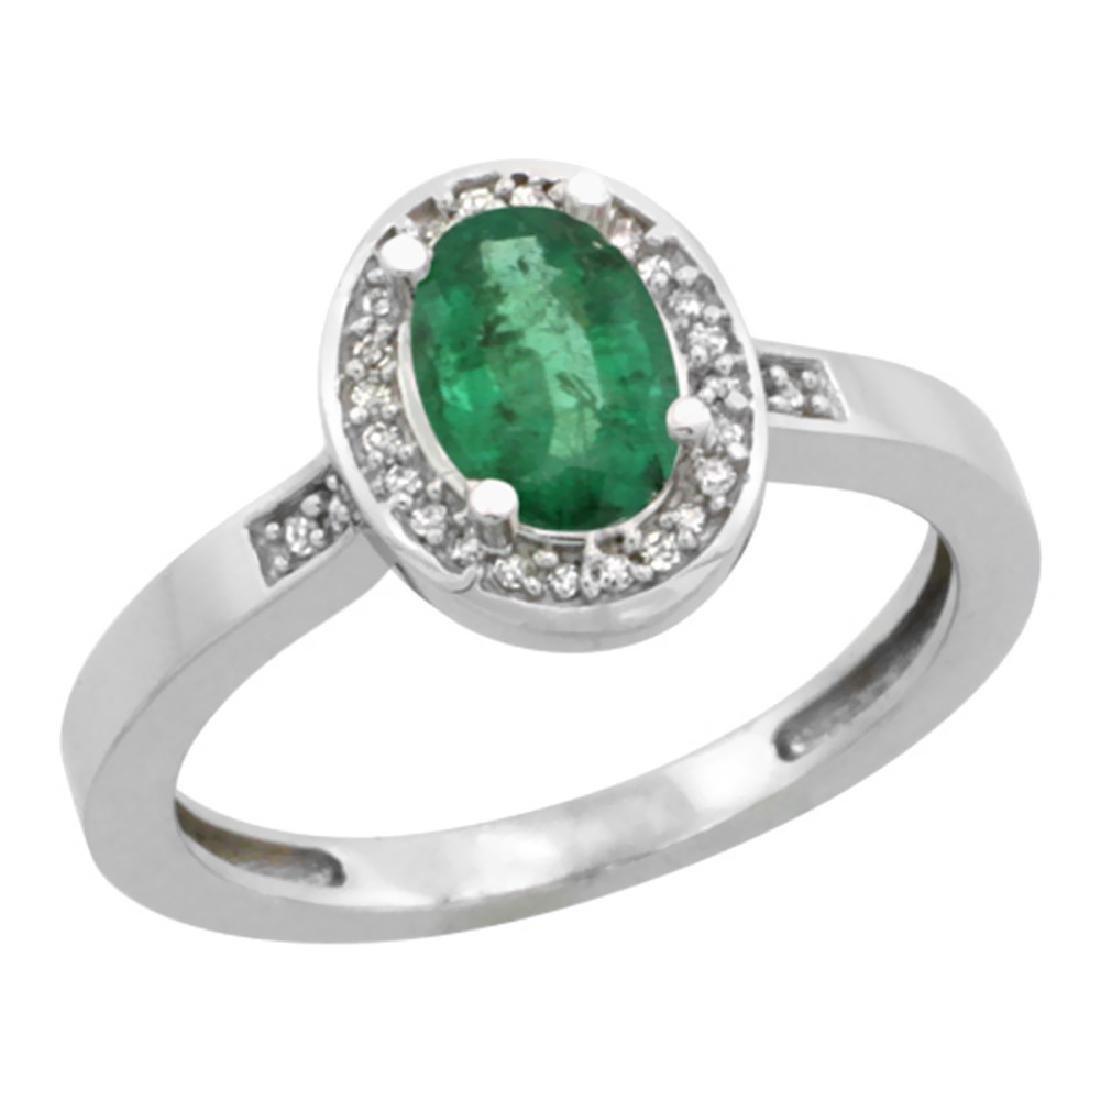 Natural 1.08 ctw Emerald & Diamond Engagement Ring 10K